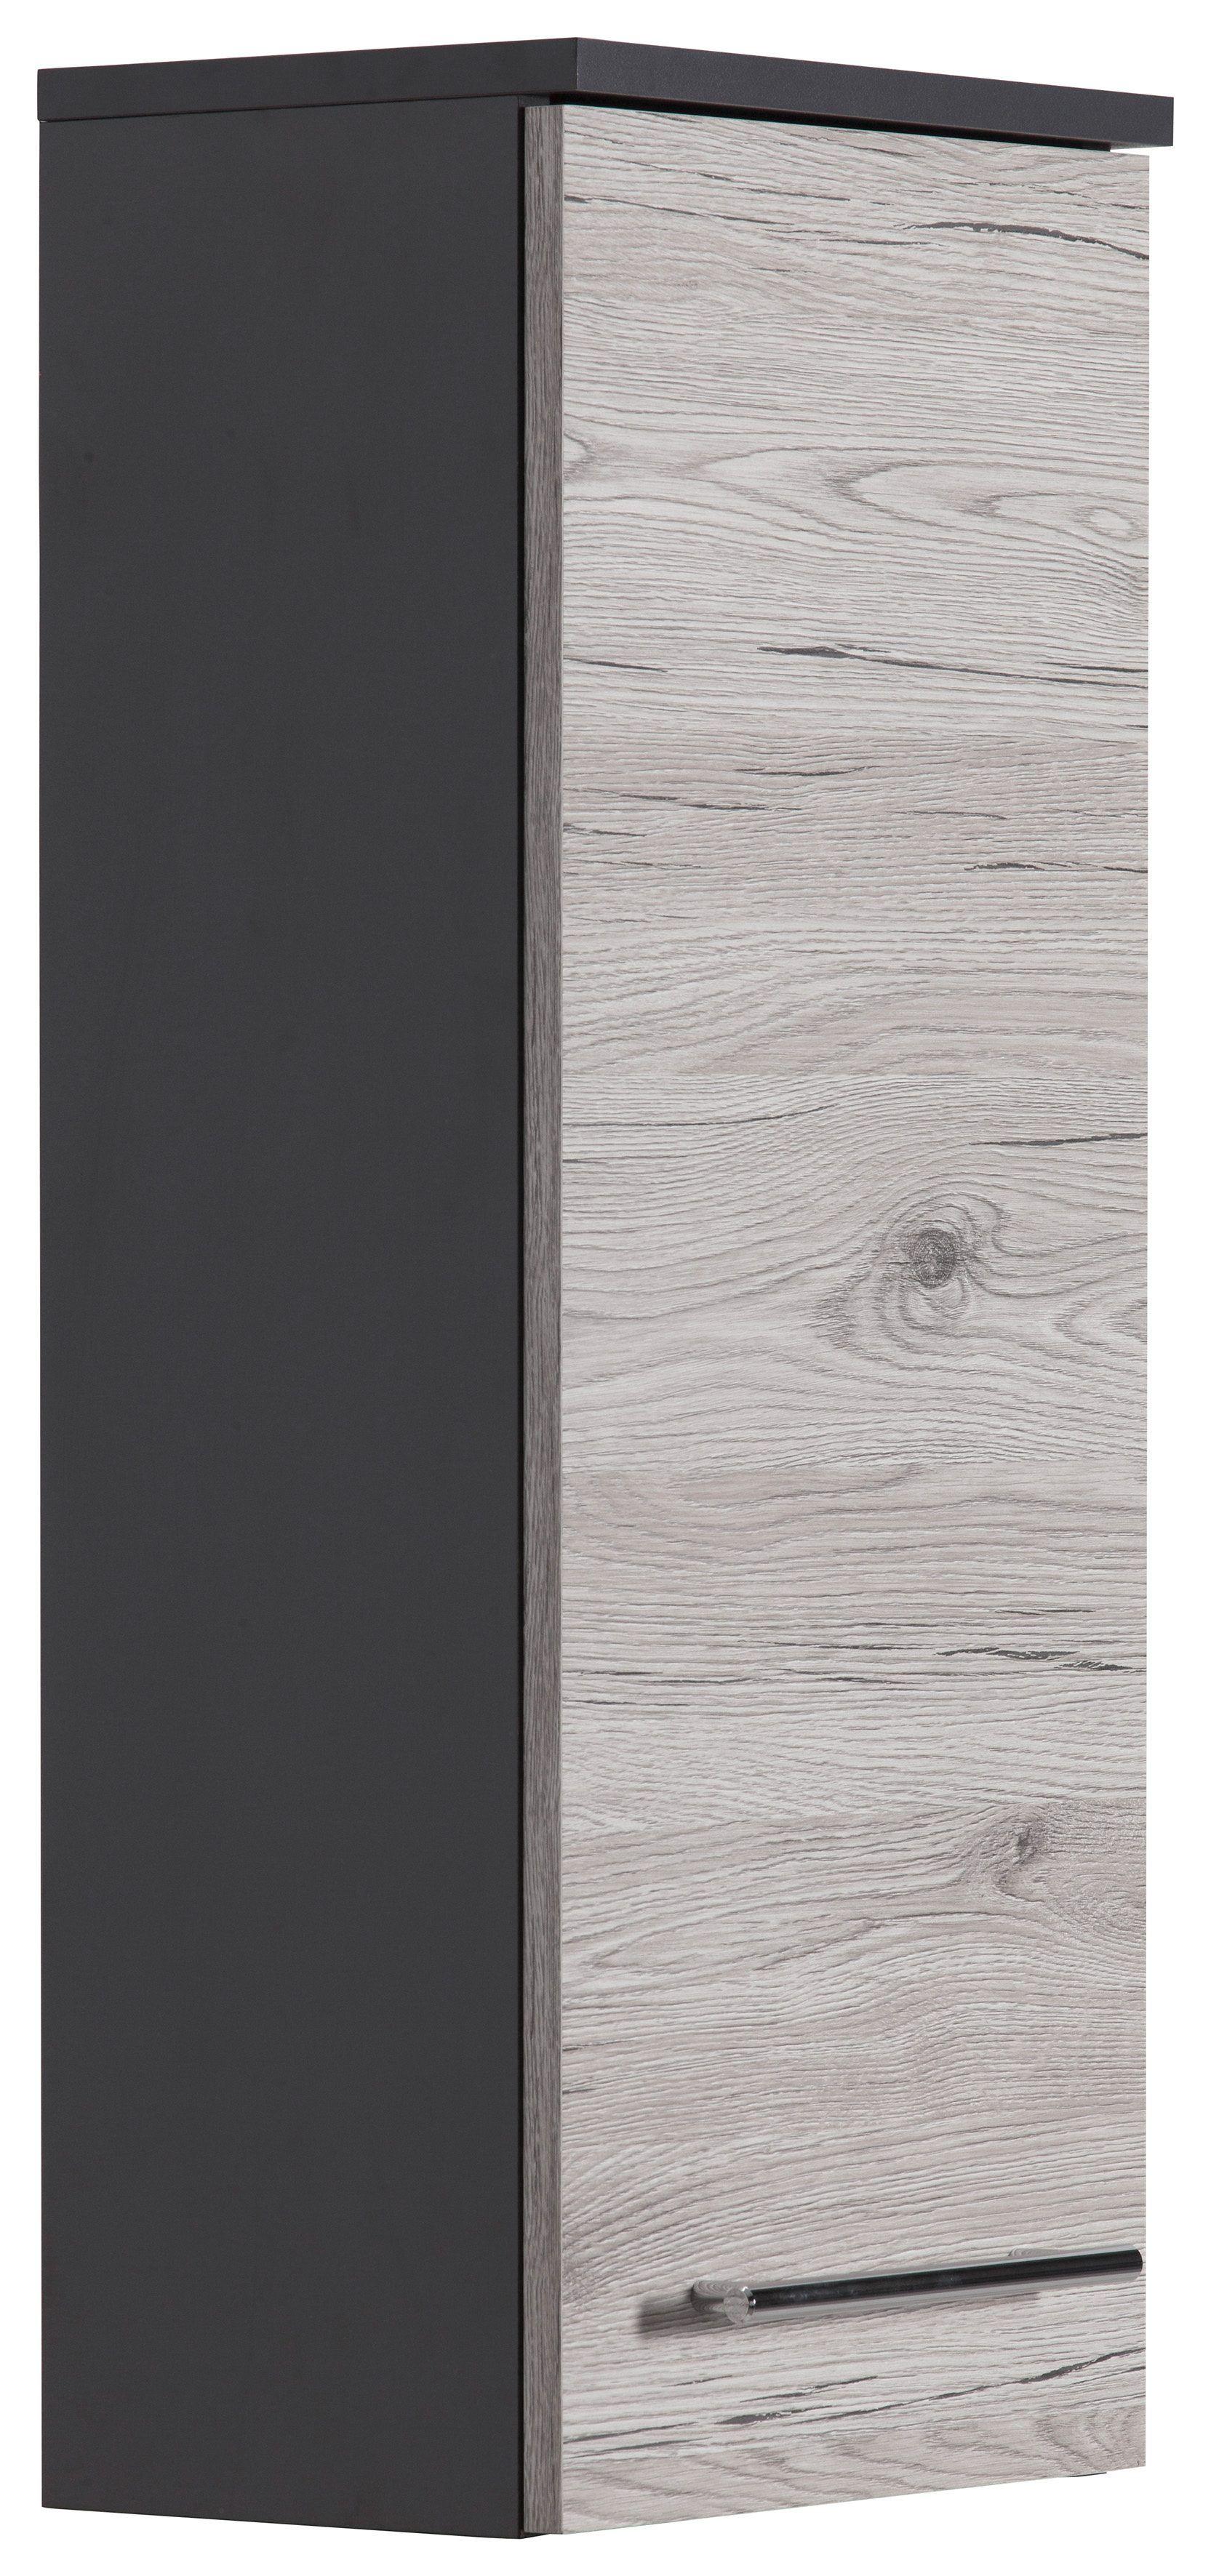 Kesper Hangeschrank Grau Breite 30cm Nora Soft Close